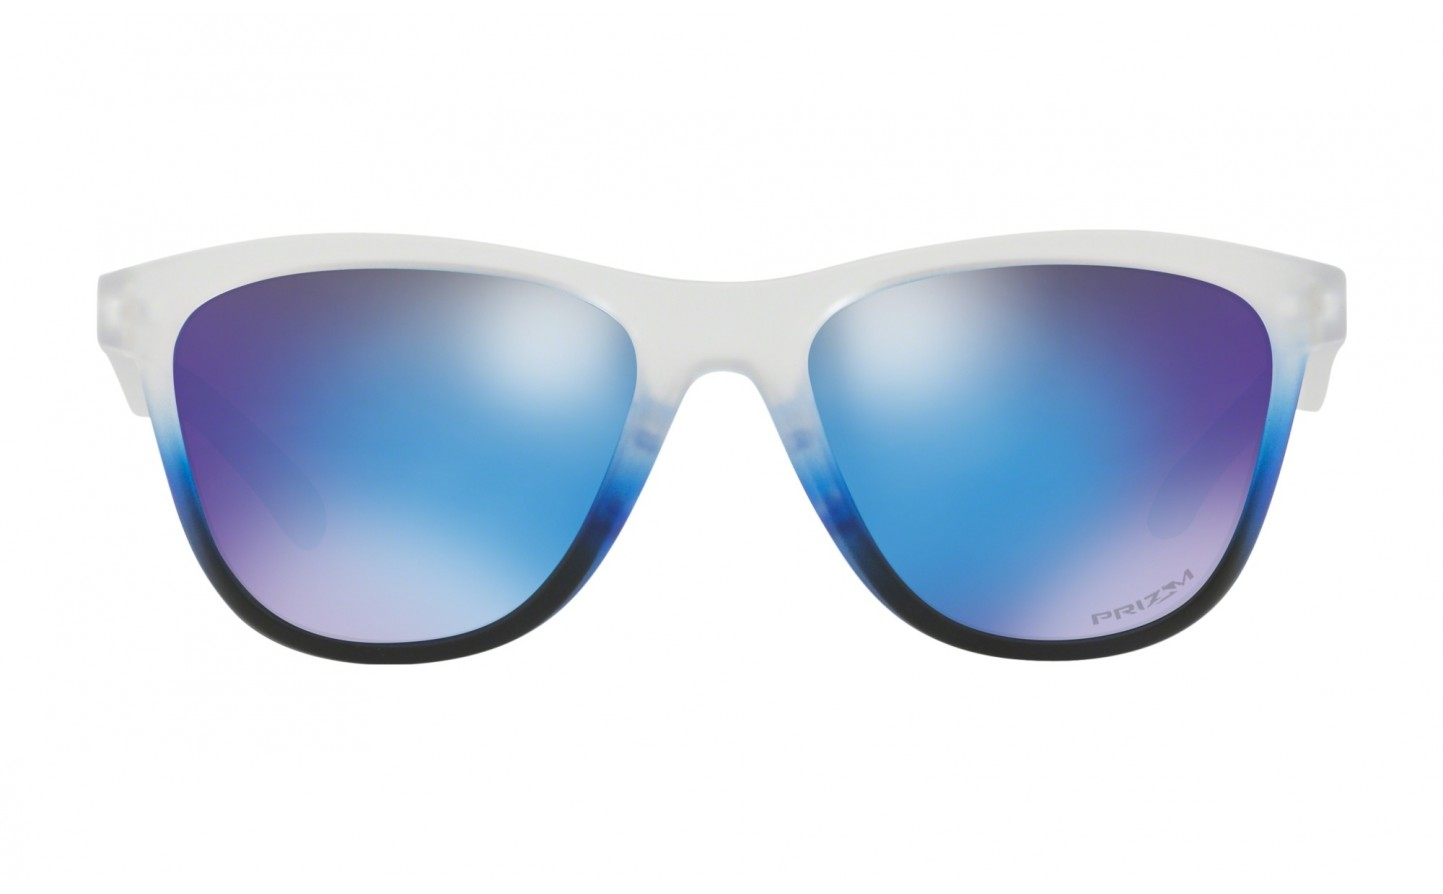 1d52cdc094 ... Gafas Sol Oakley Moonlighter Sapphire Mist Lente Prizm Sapph  |OO9320-1853| ...